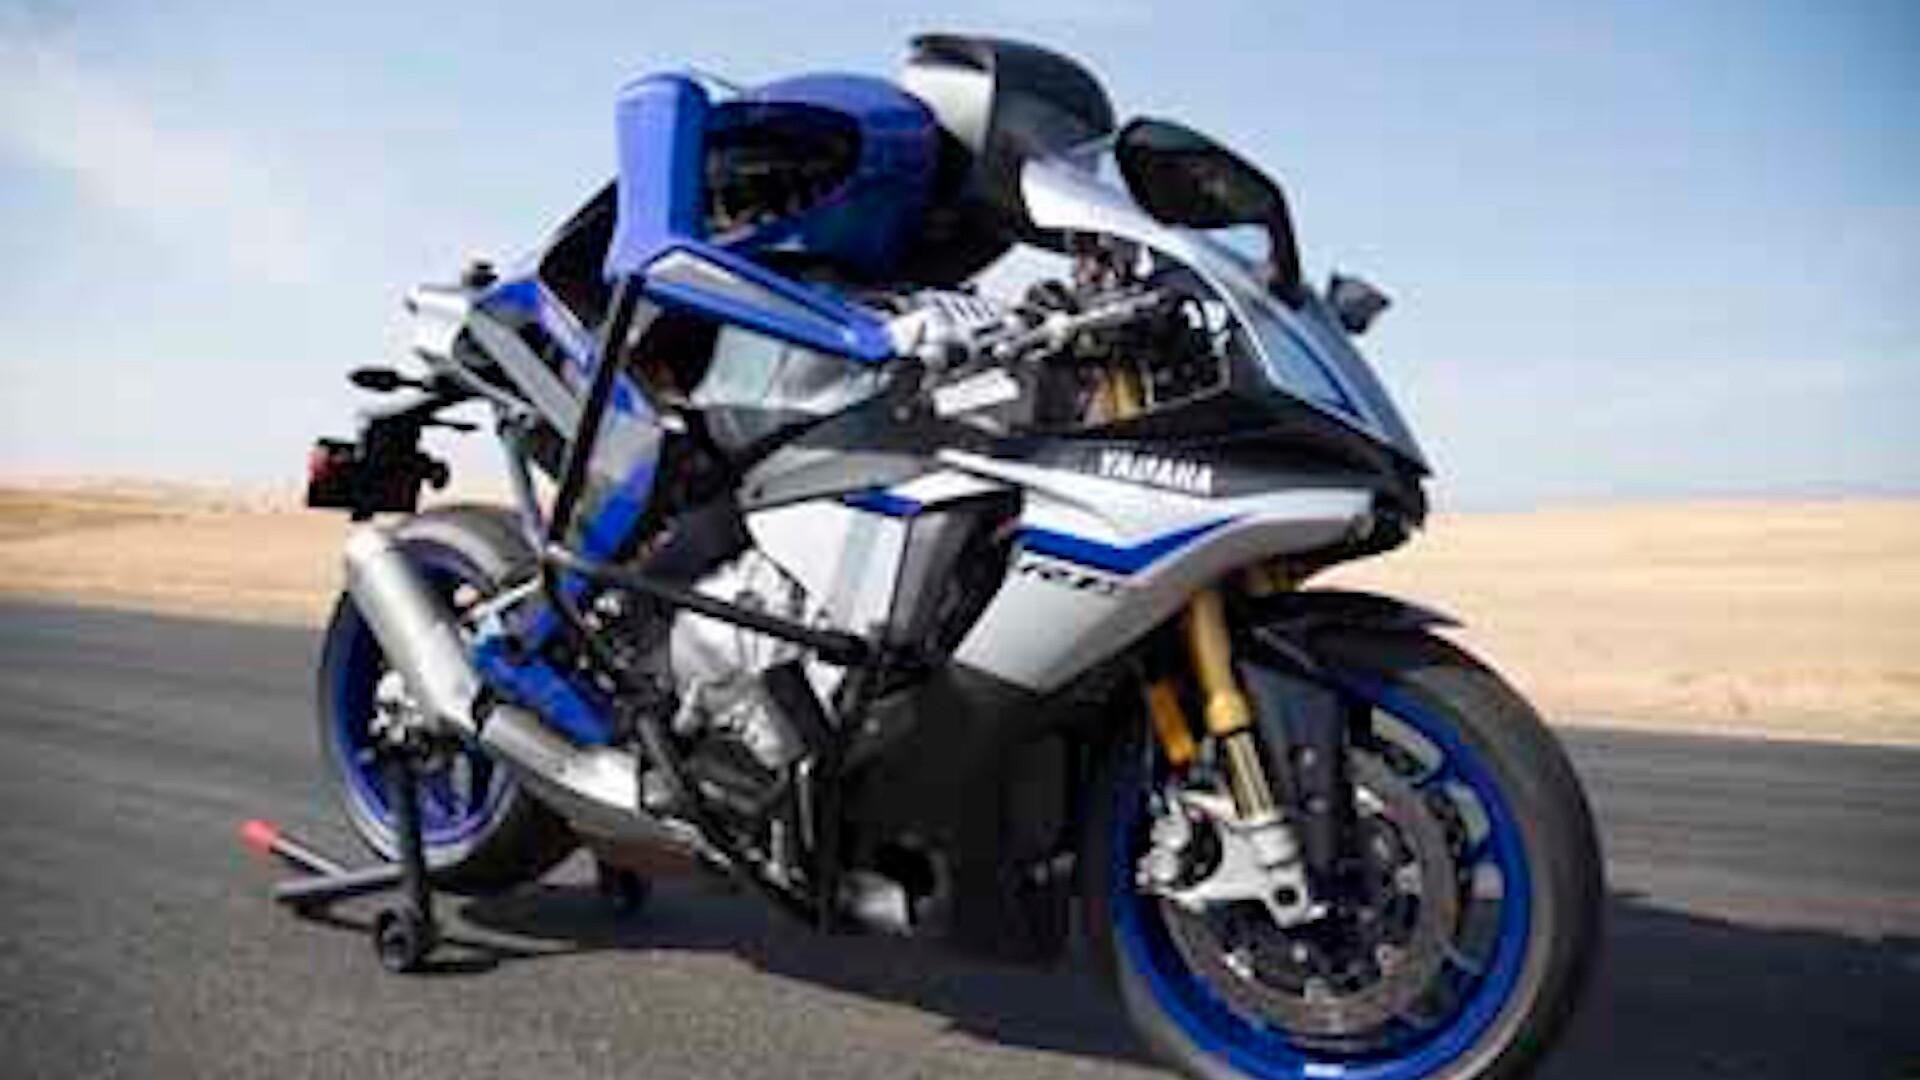 Yamaha self-driving motorcycle, Motobot